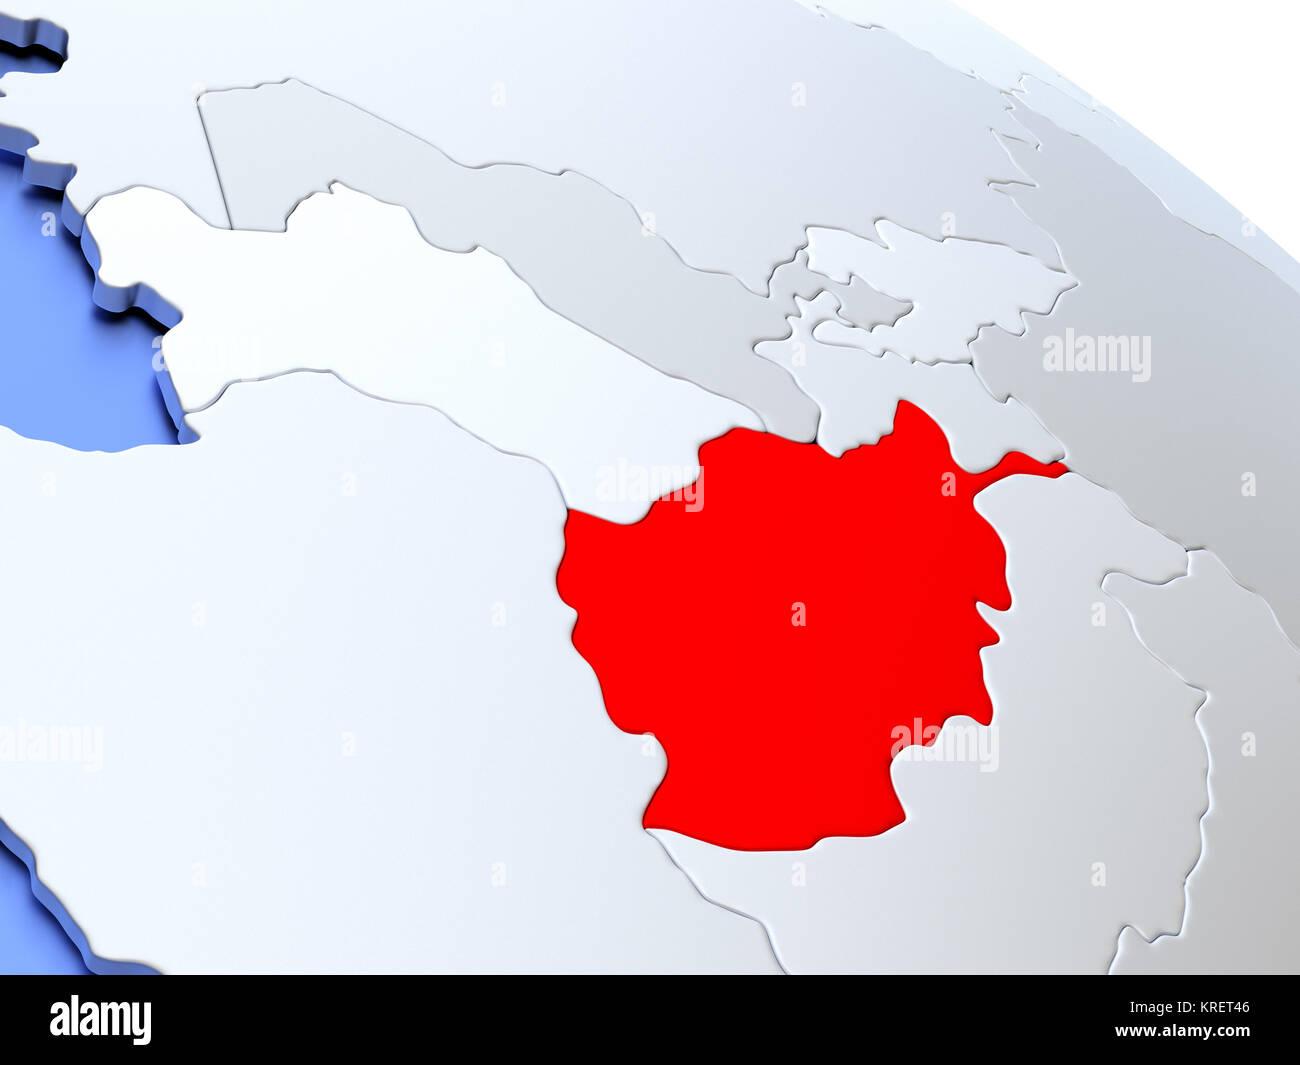 Afghanistan on world map Stock Photo: 169356662 - Alamy